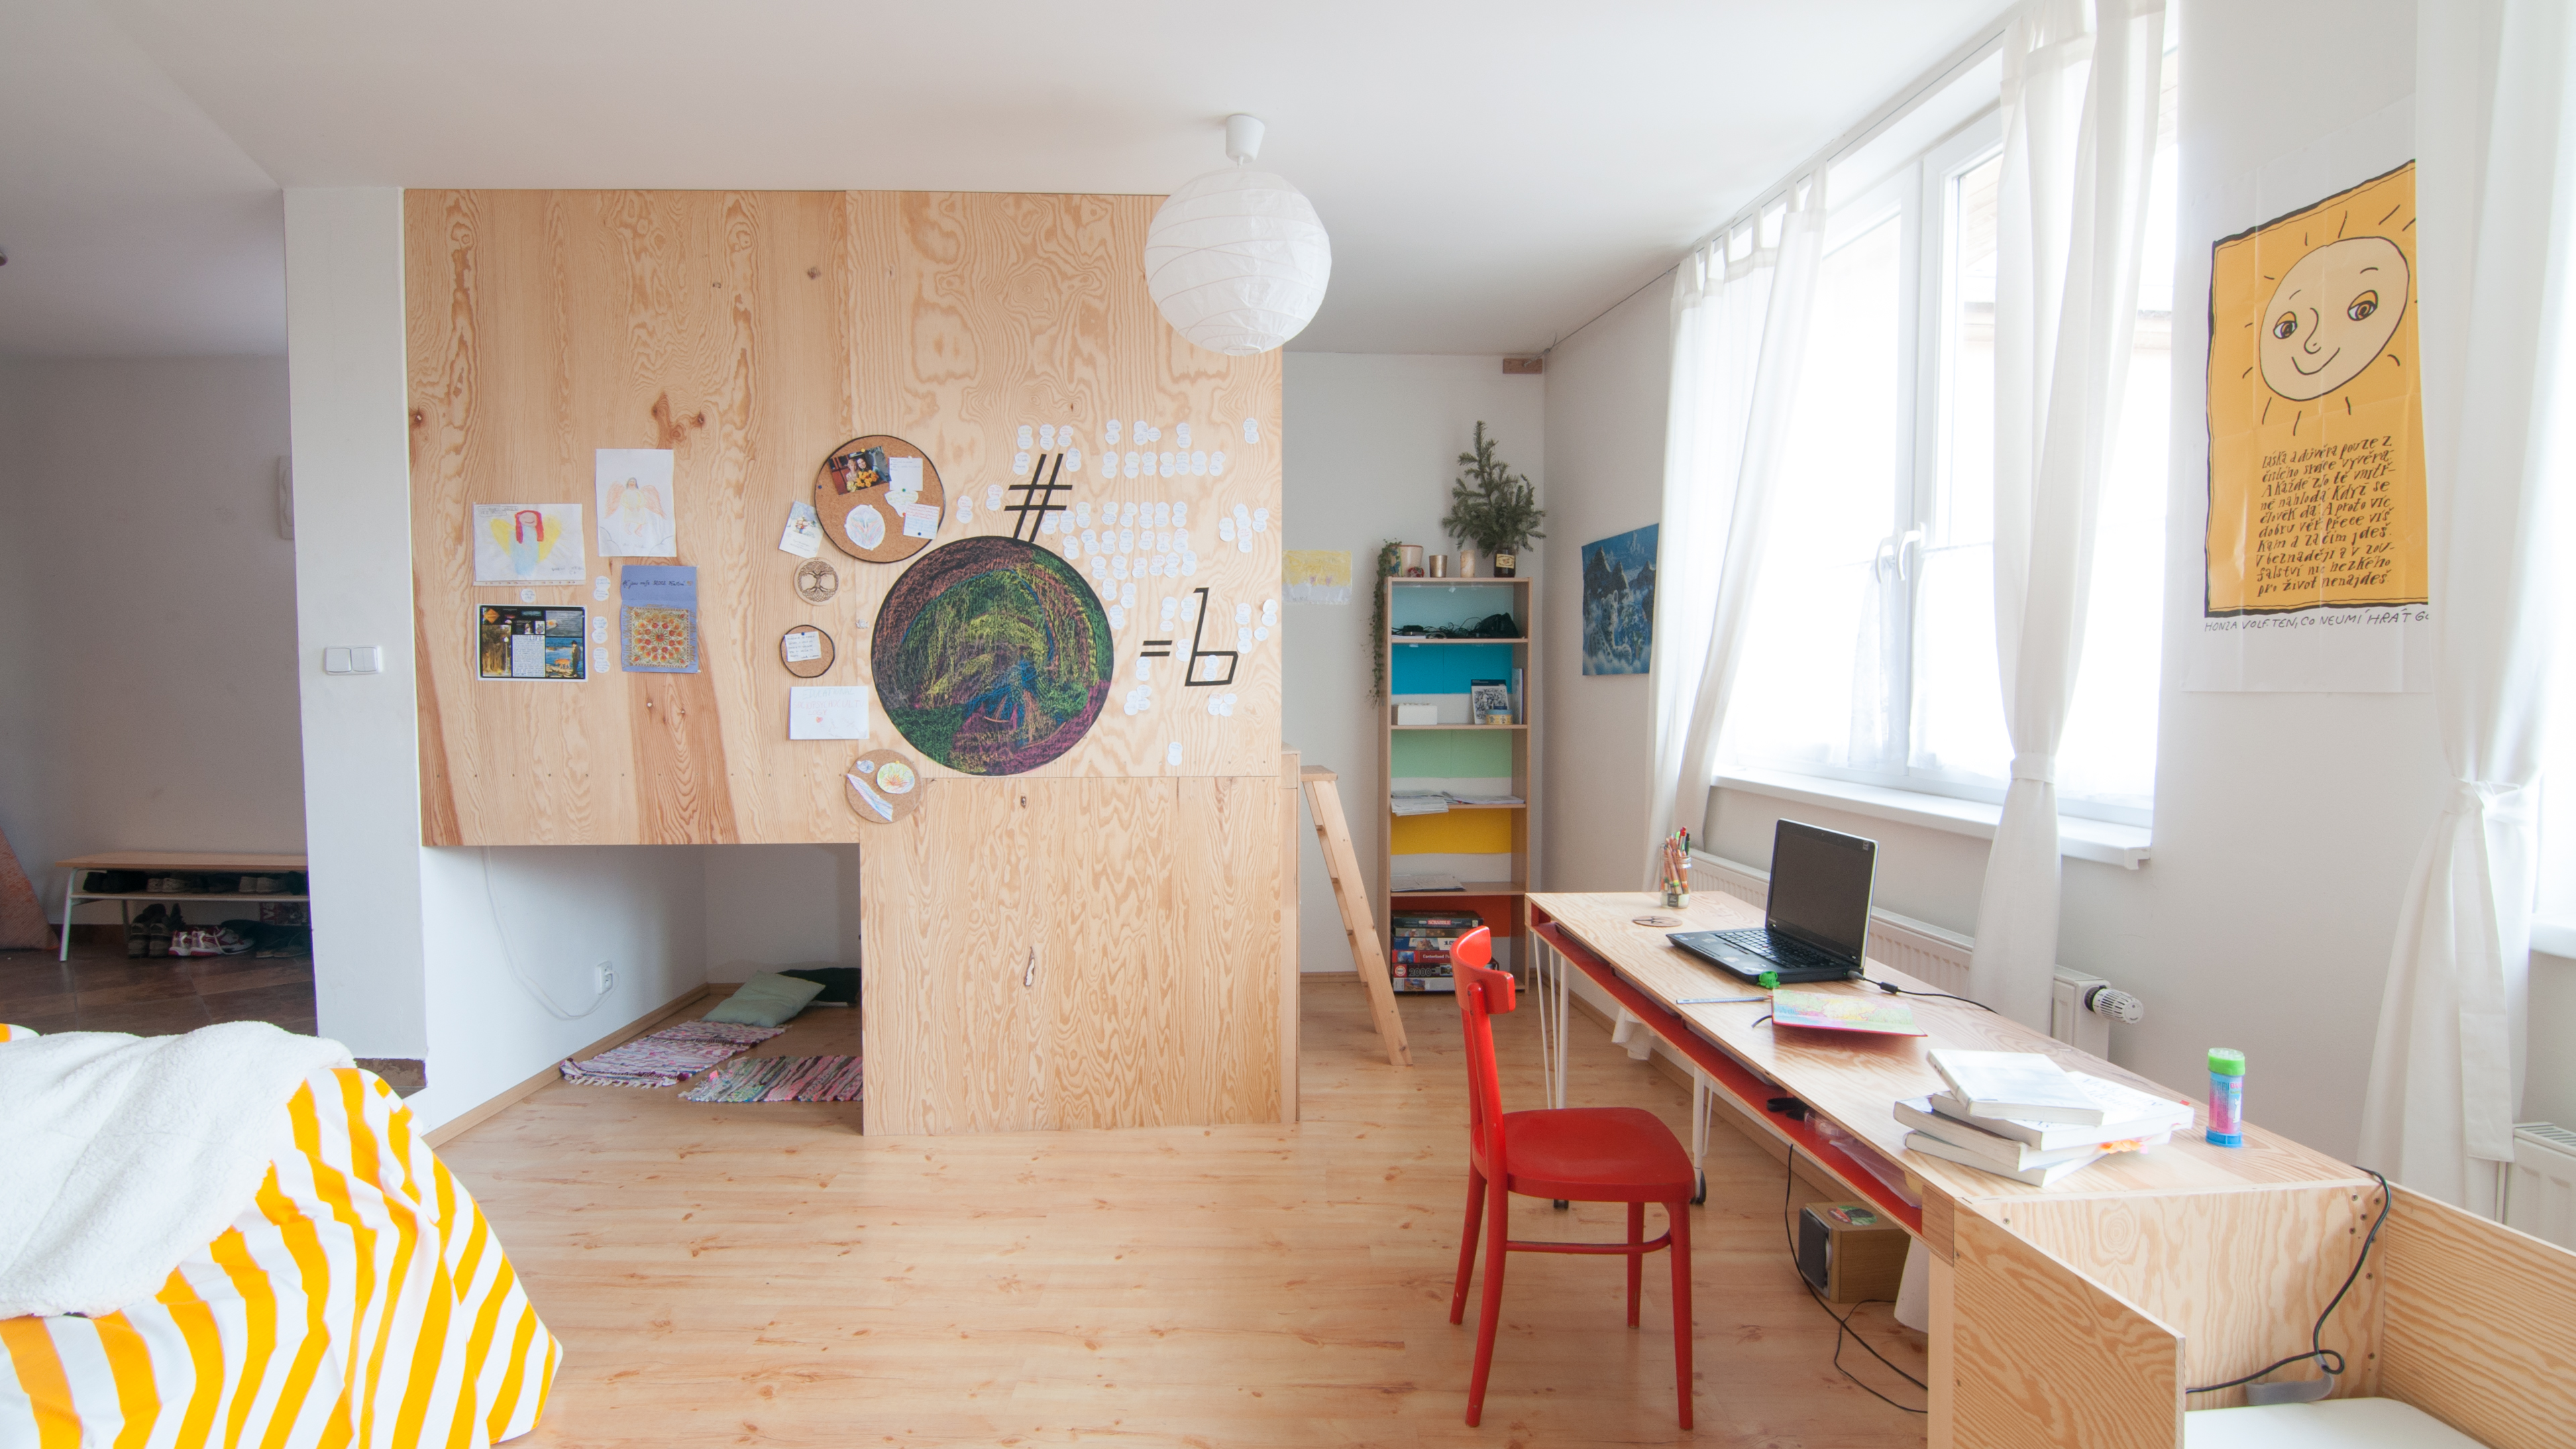 bunker-v-izbe-interierovy-navrh-tototu-studio